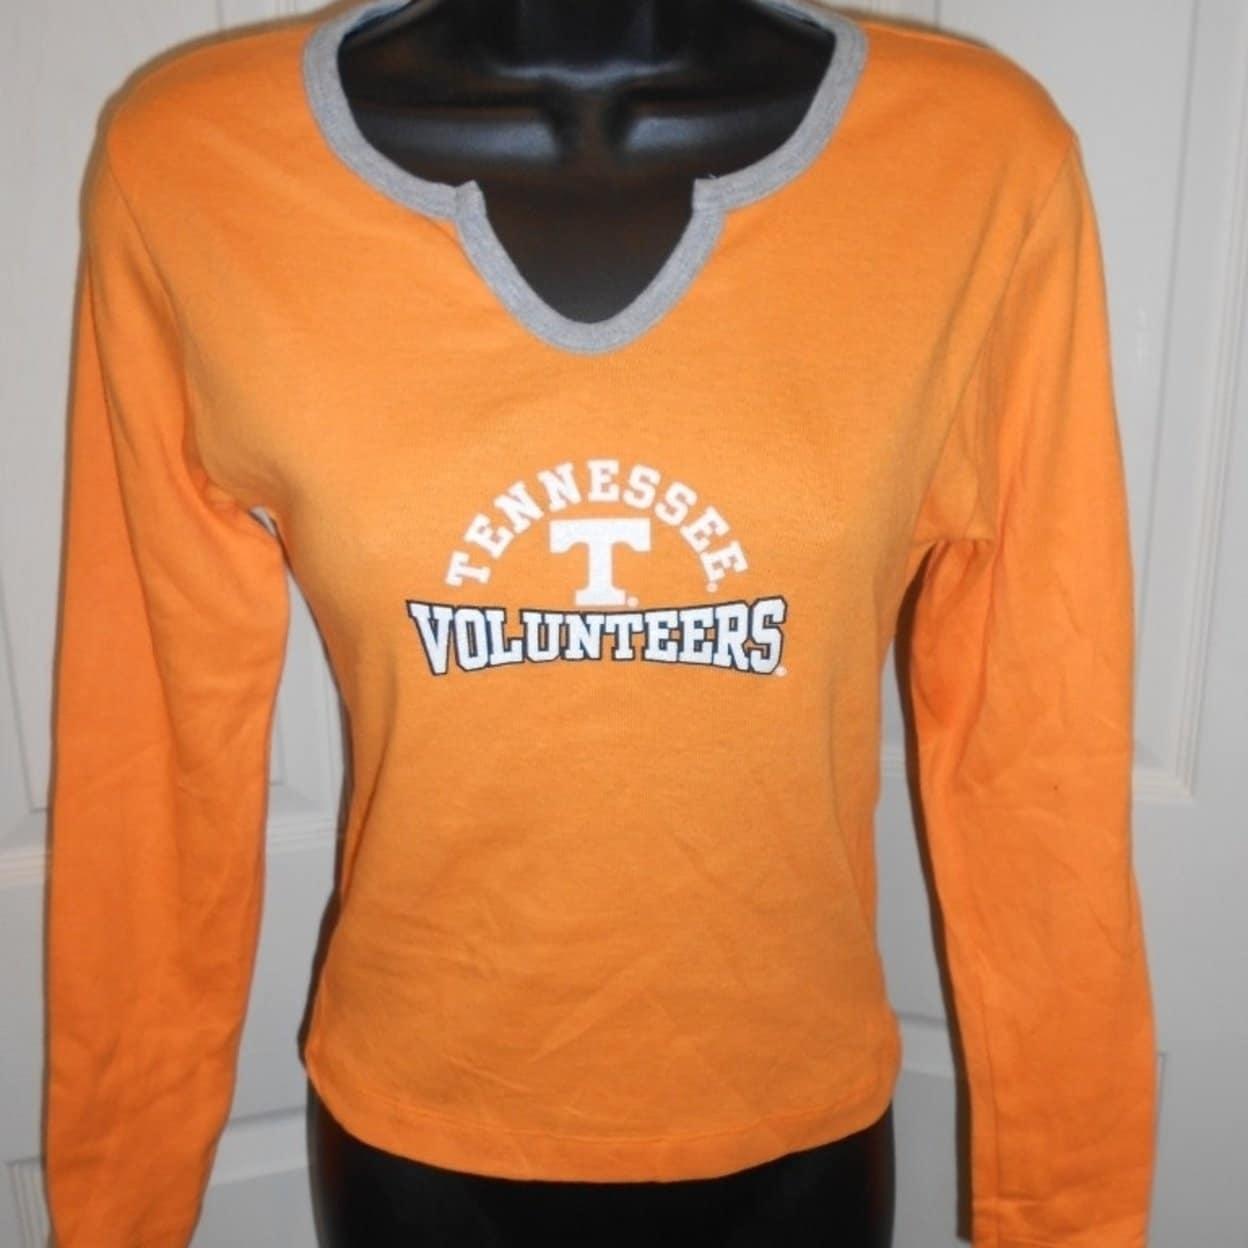 NEW Tennessee Volunteers Girls Juniors Sizes S-M-L-XL Shirt